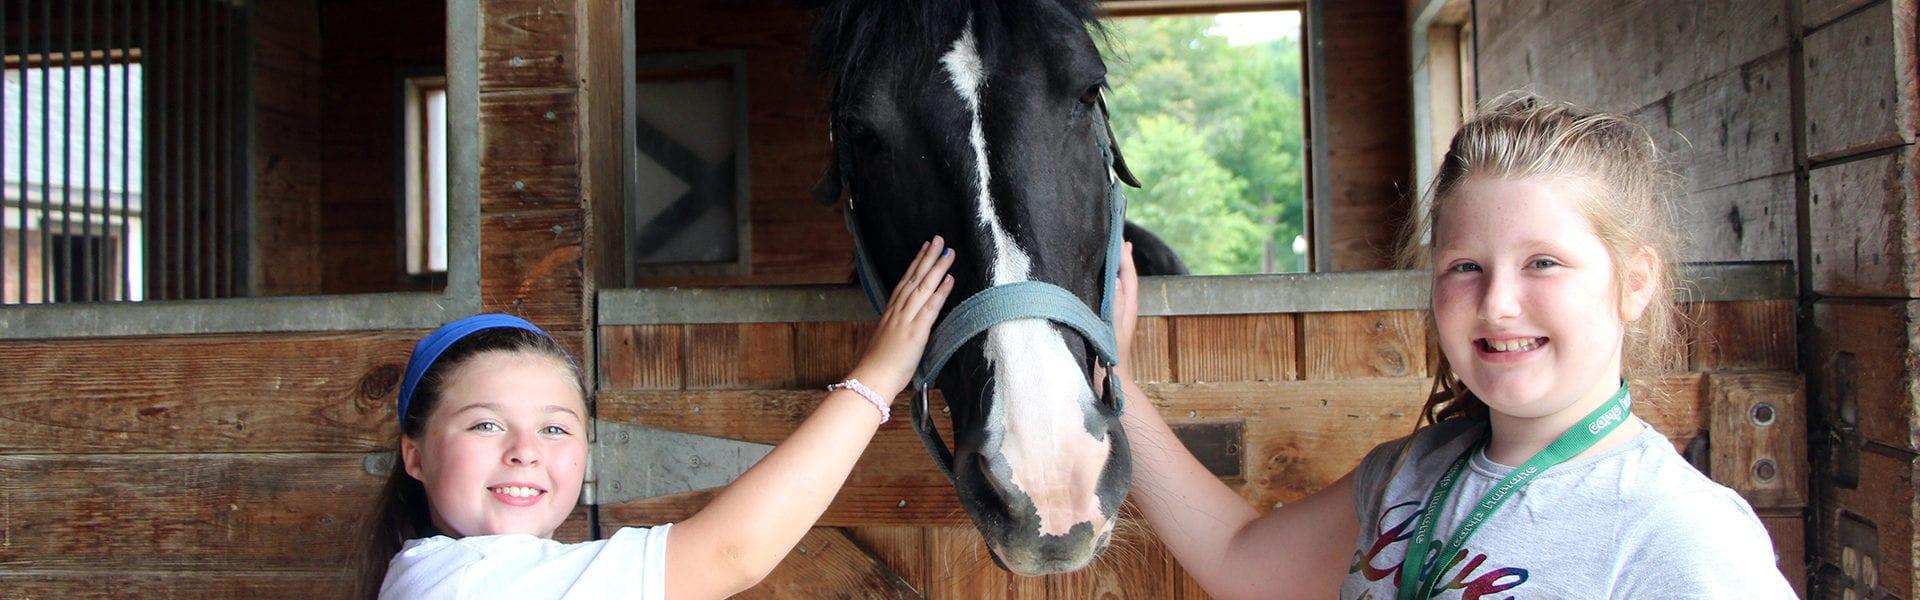 Camp Humane campers visit Equine Advocates